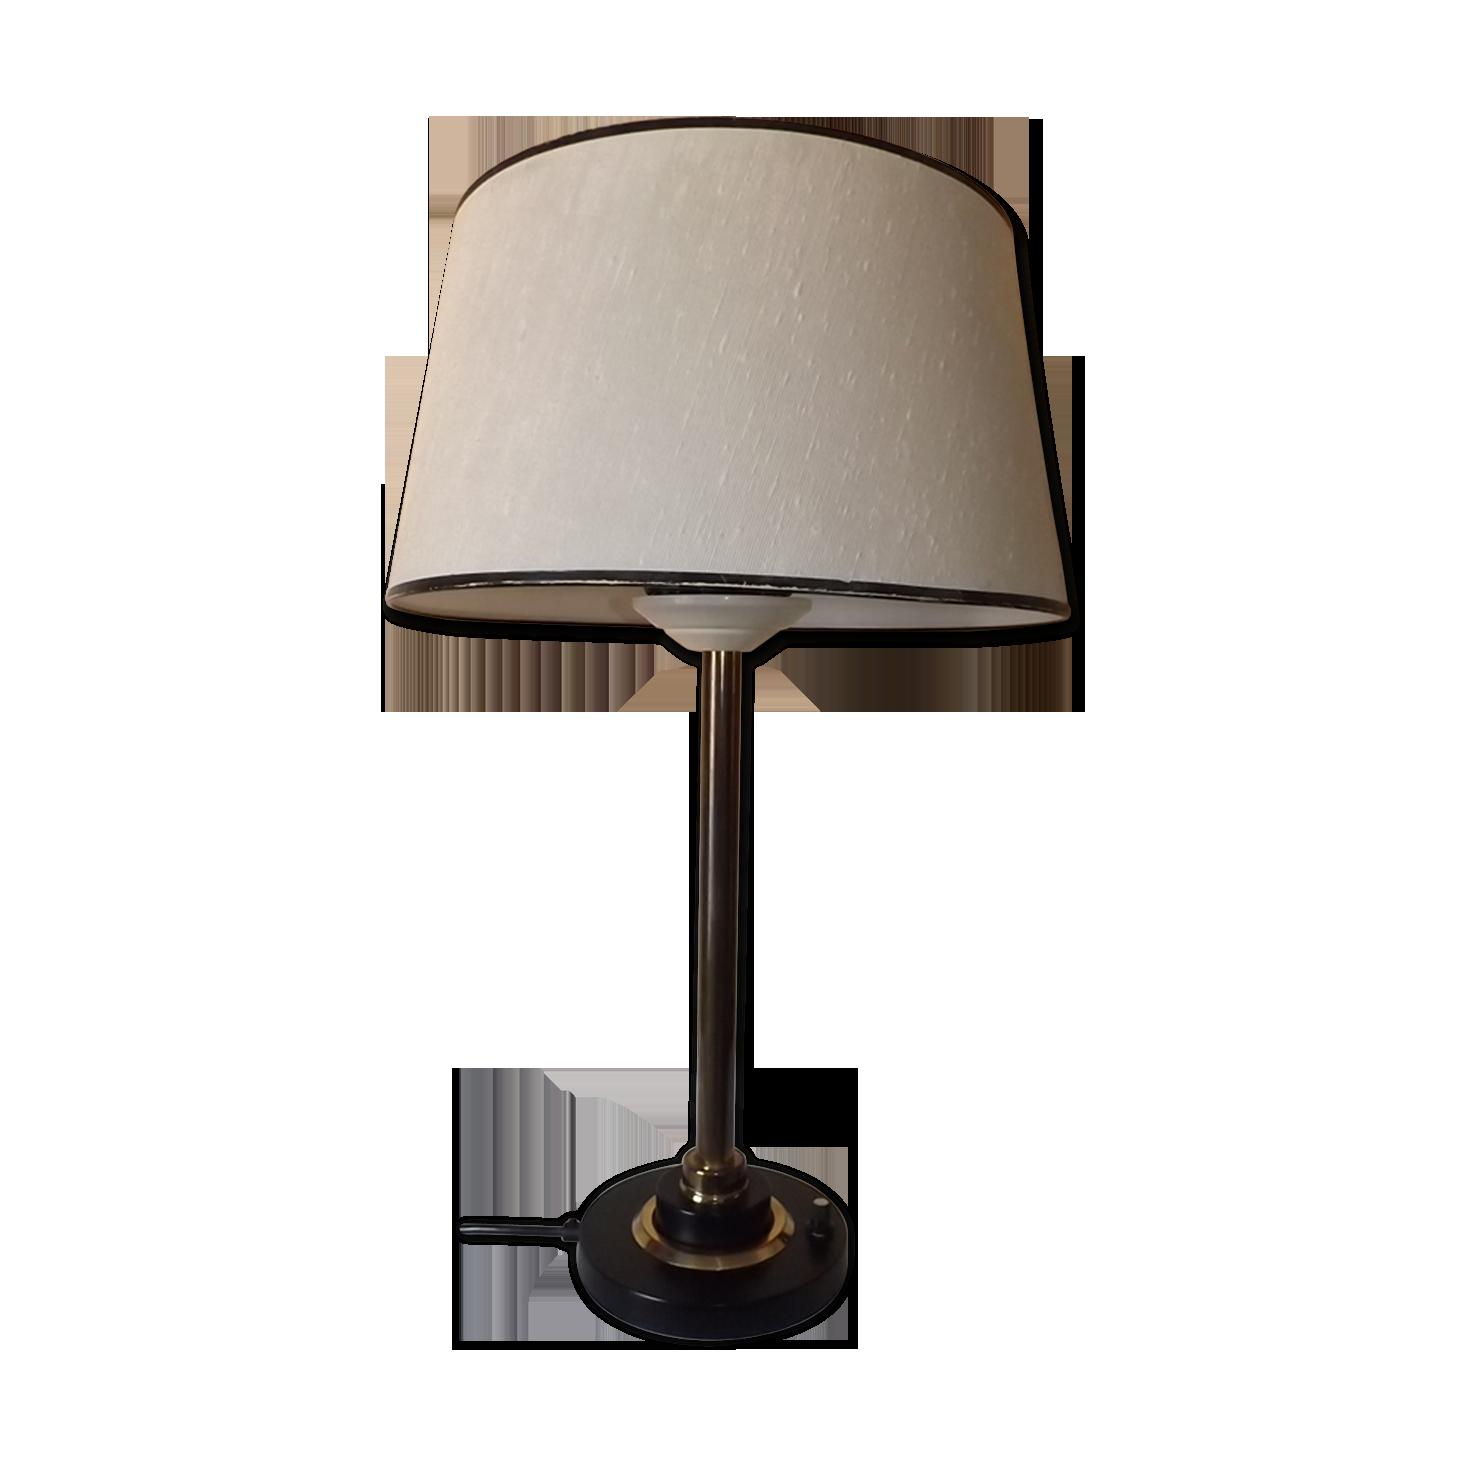 Lampe de bureau maison arlus brass golden vintage vul ynb